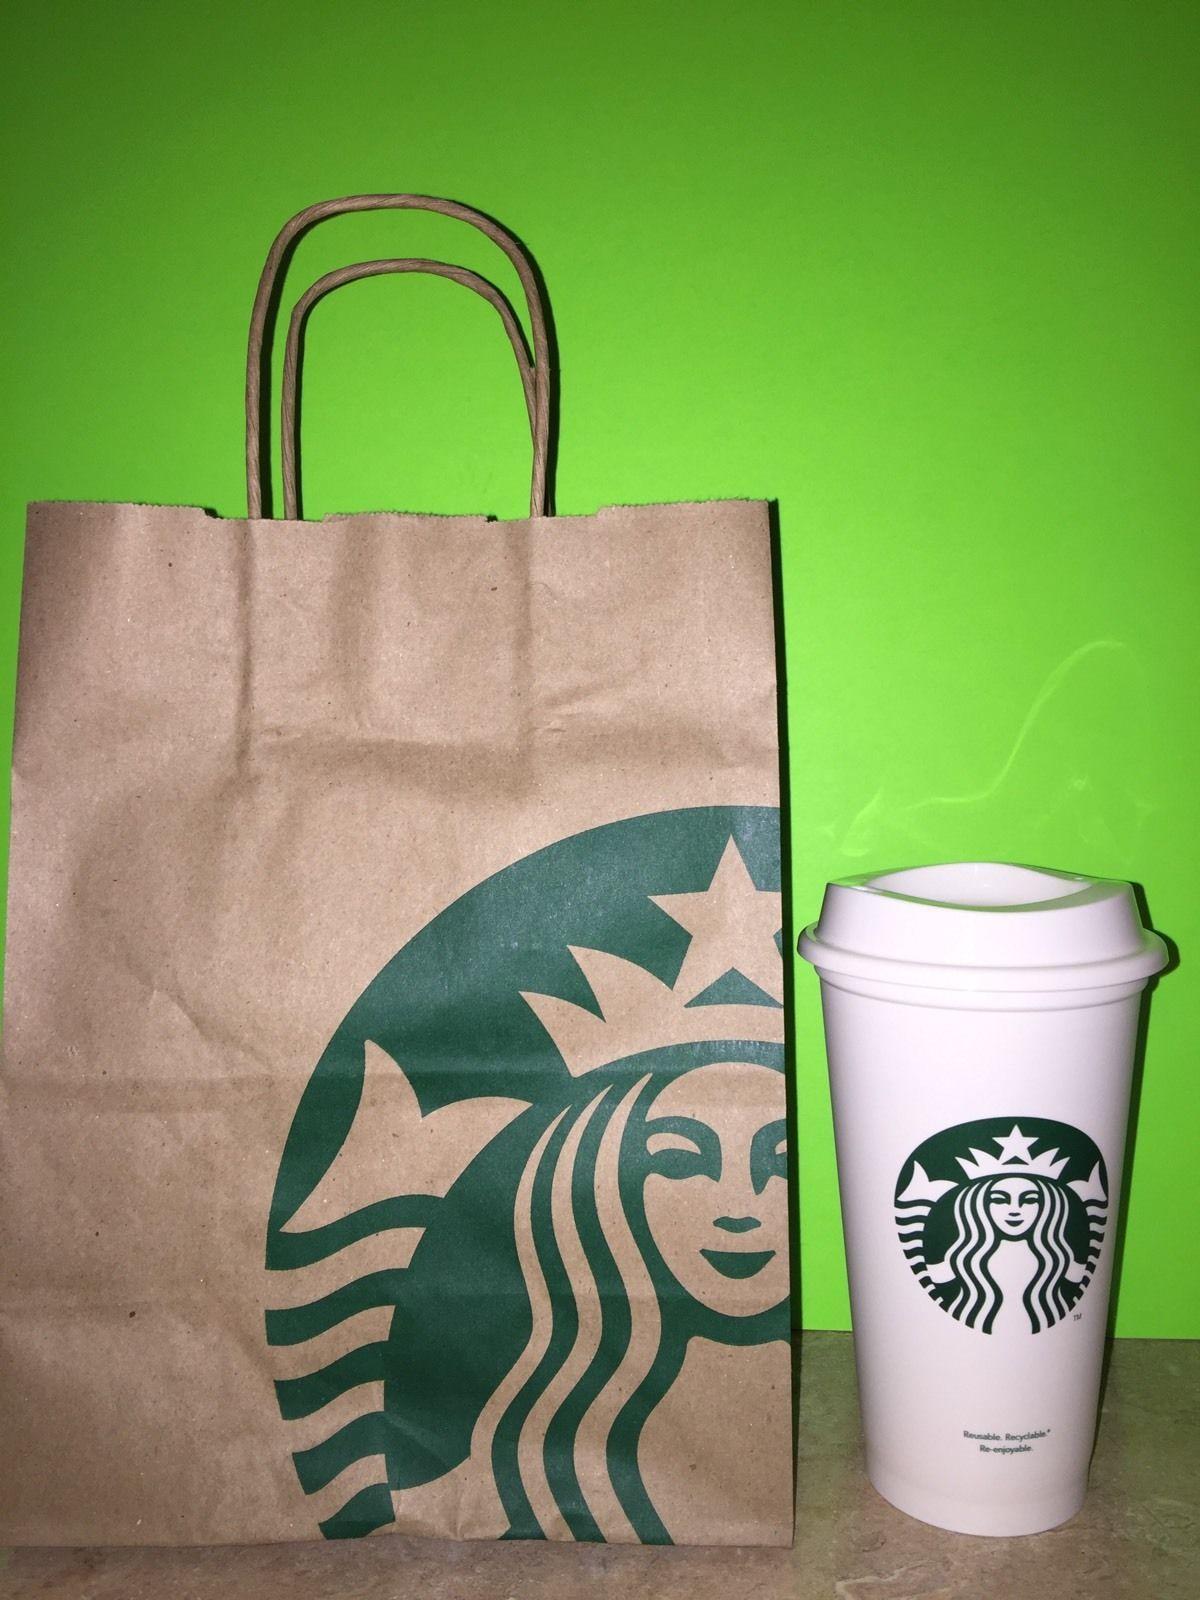 New Starbucks Reusable Coffee Tea 16oz Cup with Lid